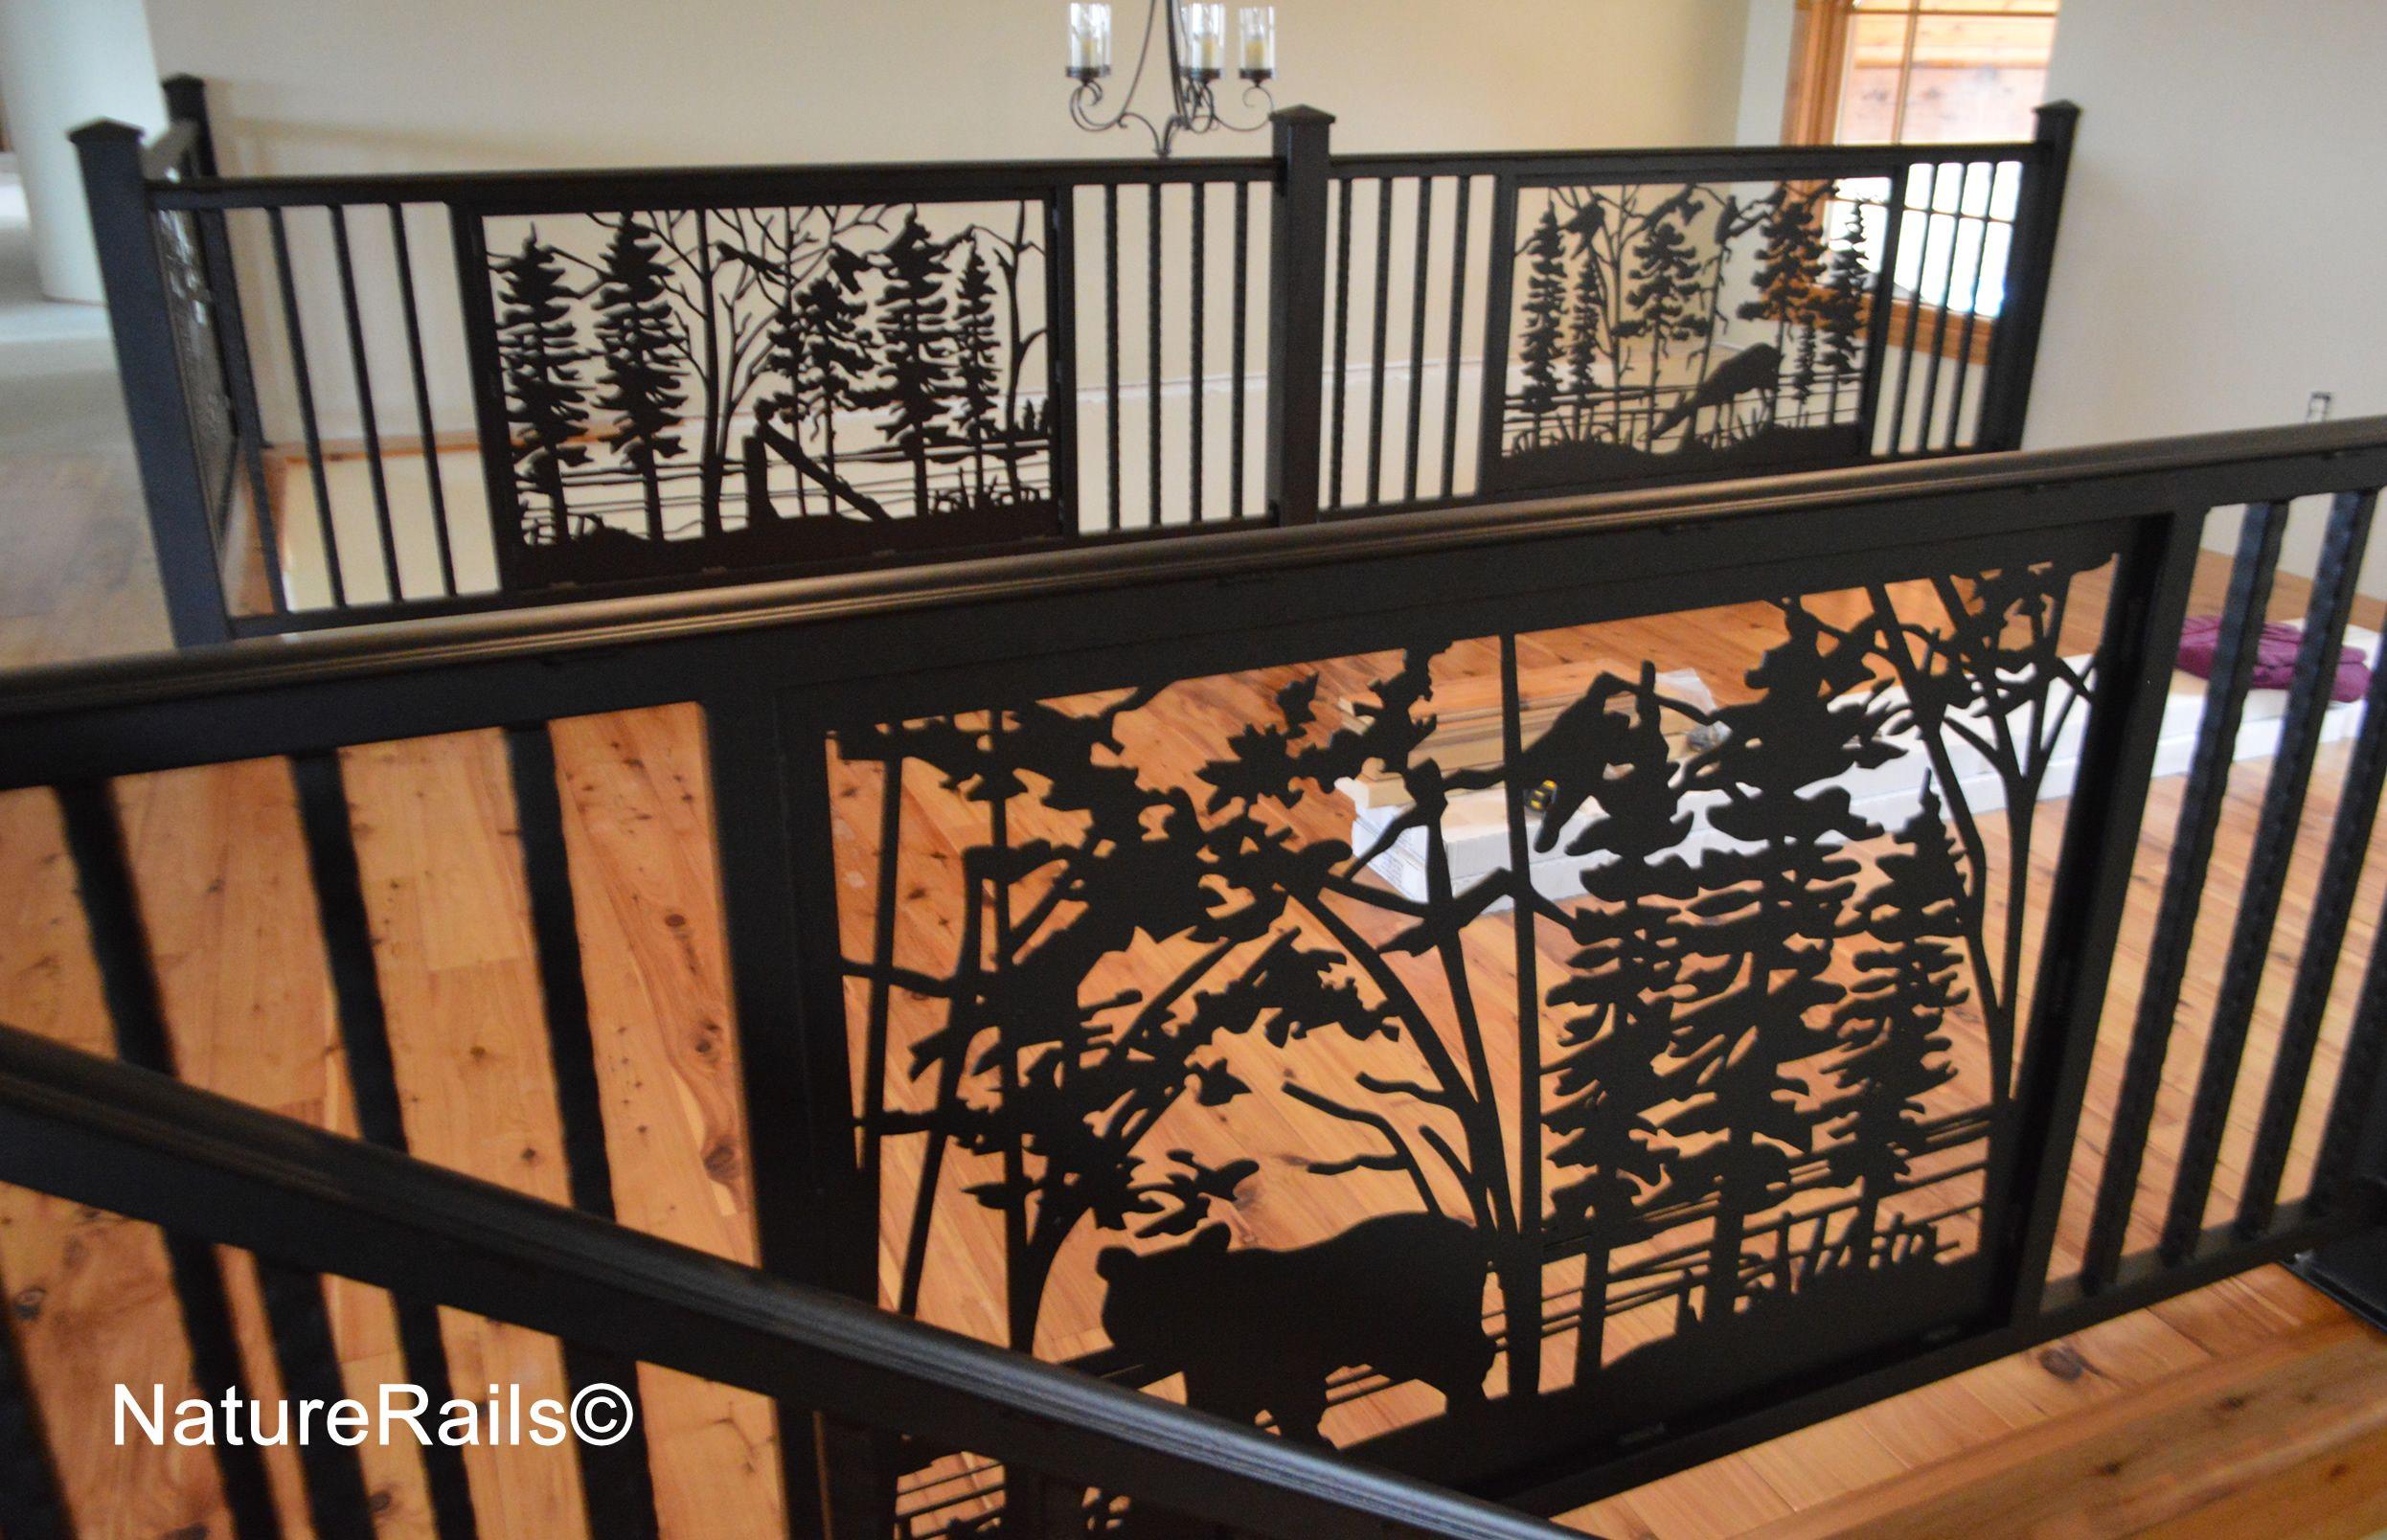 Deck Loft Balcony Railing Fence Decor Fence Design Fence